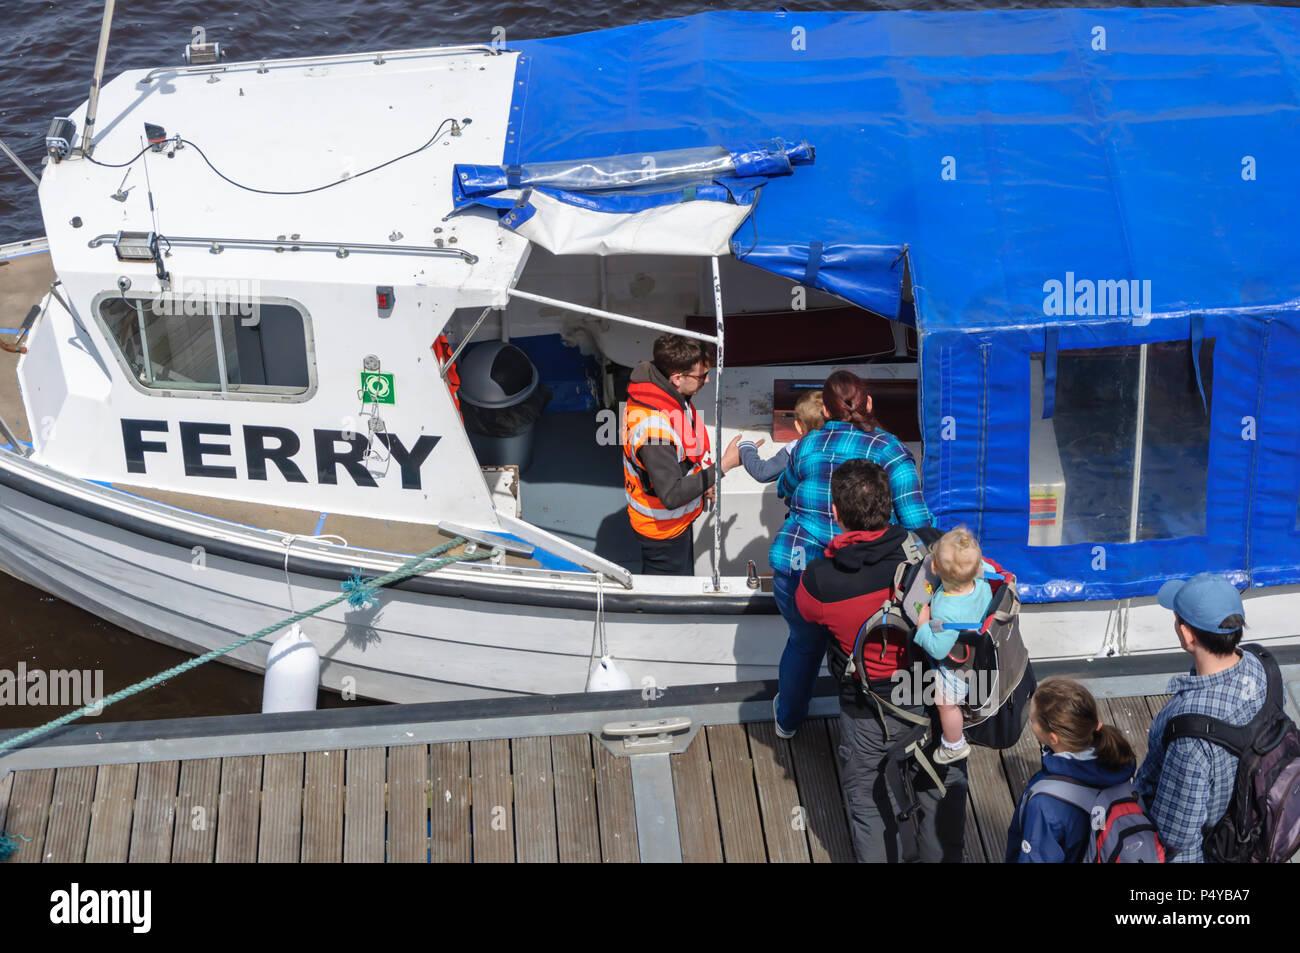 88cd71affc Mast Step Immagini   Mast Step Fotos Stock - Alamy